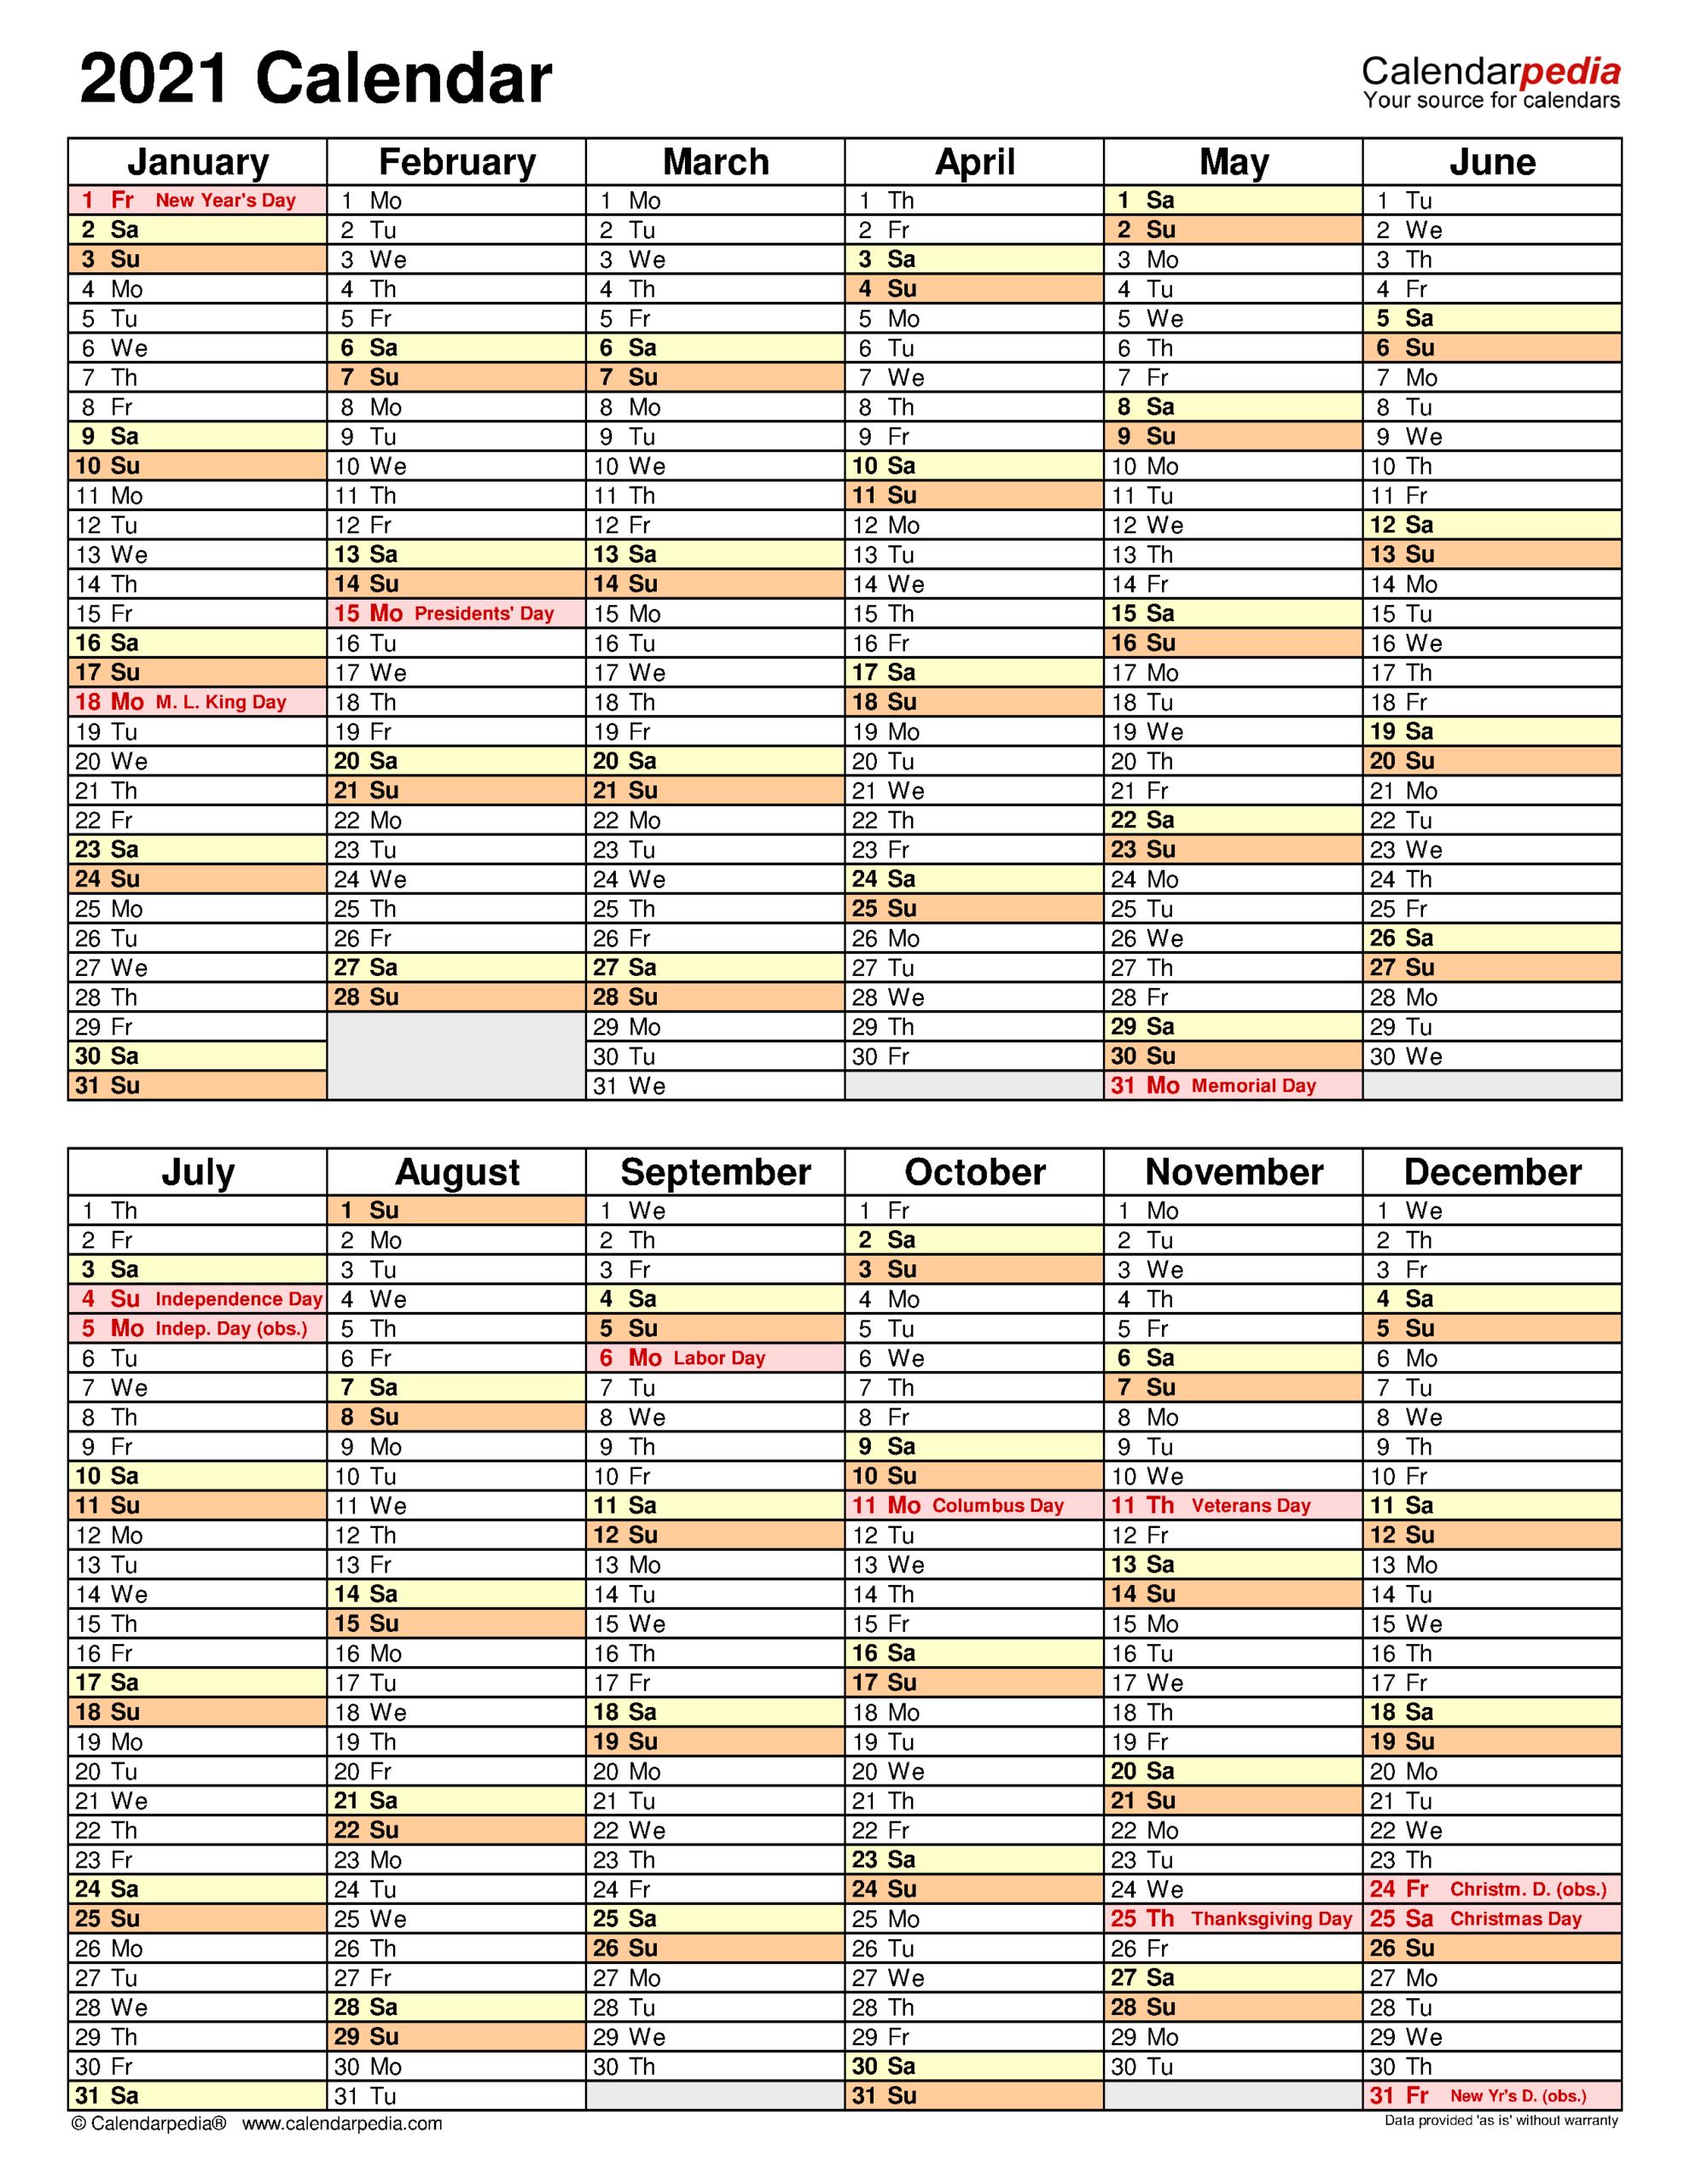 2021 Calendar - Free Printable Excel Templates - Calendarpedia intended for 2021 Shift Calendar Free